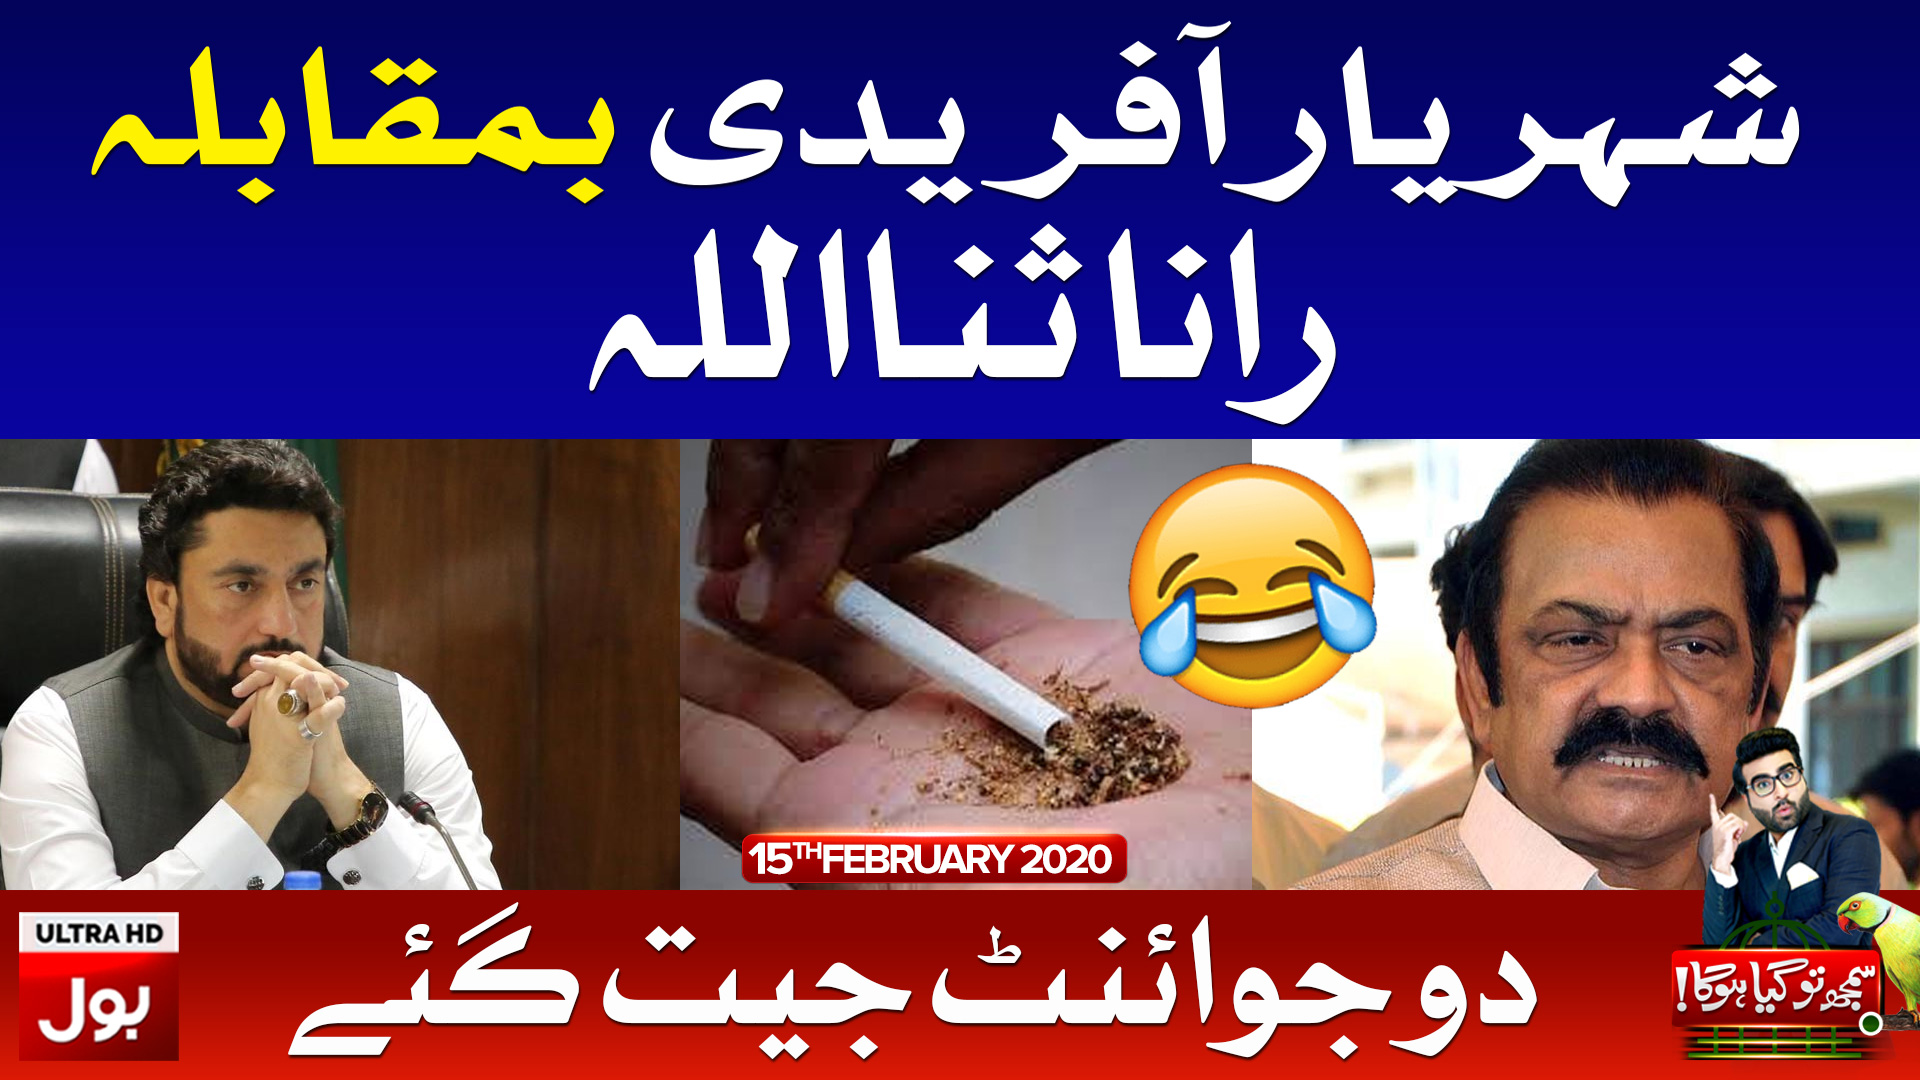 Samajh Tu Gaya Hoga | Comedy Show with Fahim Khan | Full Episode 15th feb 2020 | BOL News